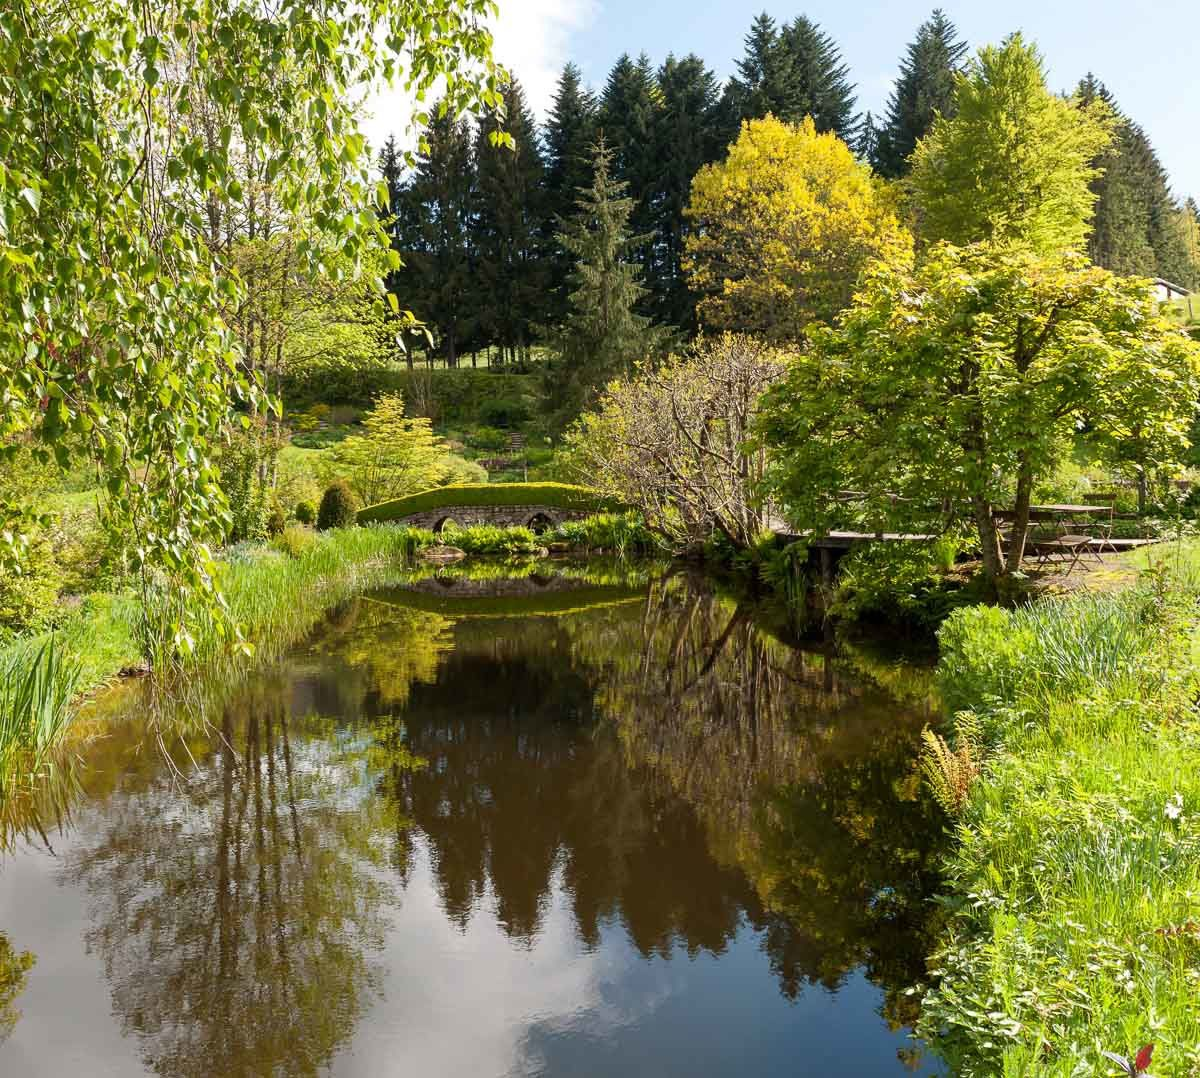 Proche de BRUYERES-VOSGES : une visite au Jardin de BERCHIGRANGES